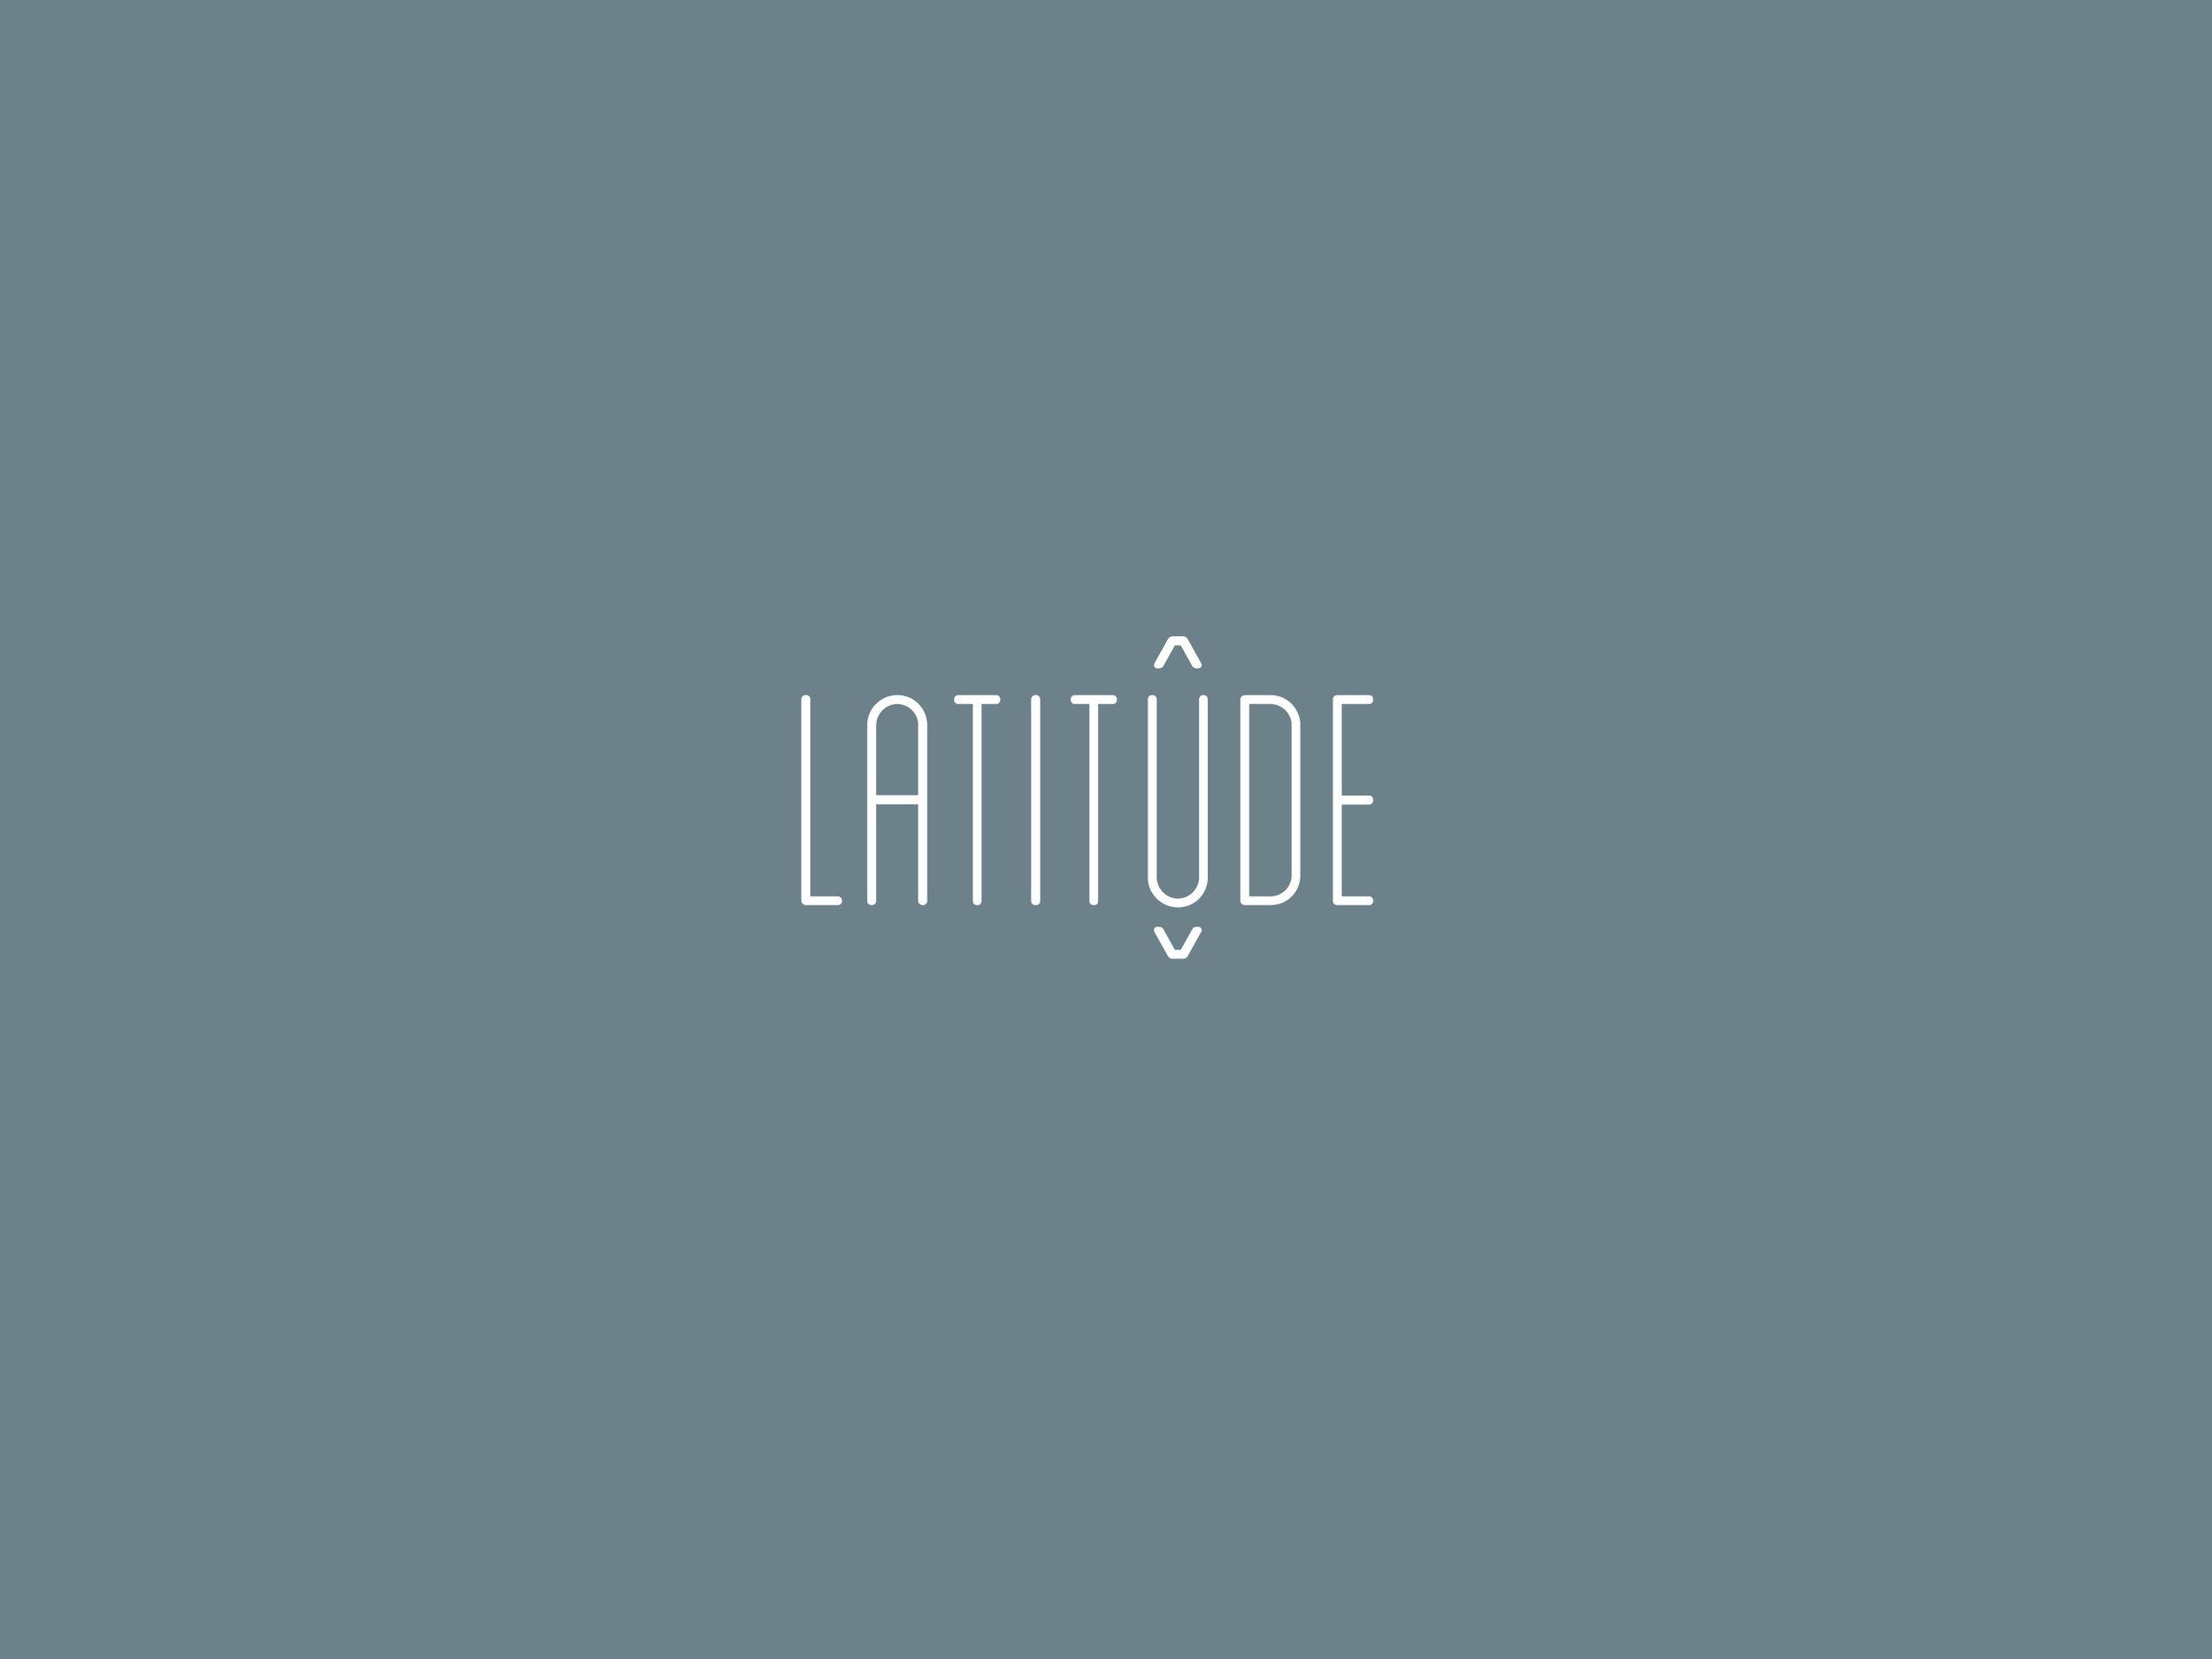 Latitude Logo.jpg